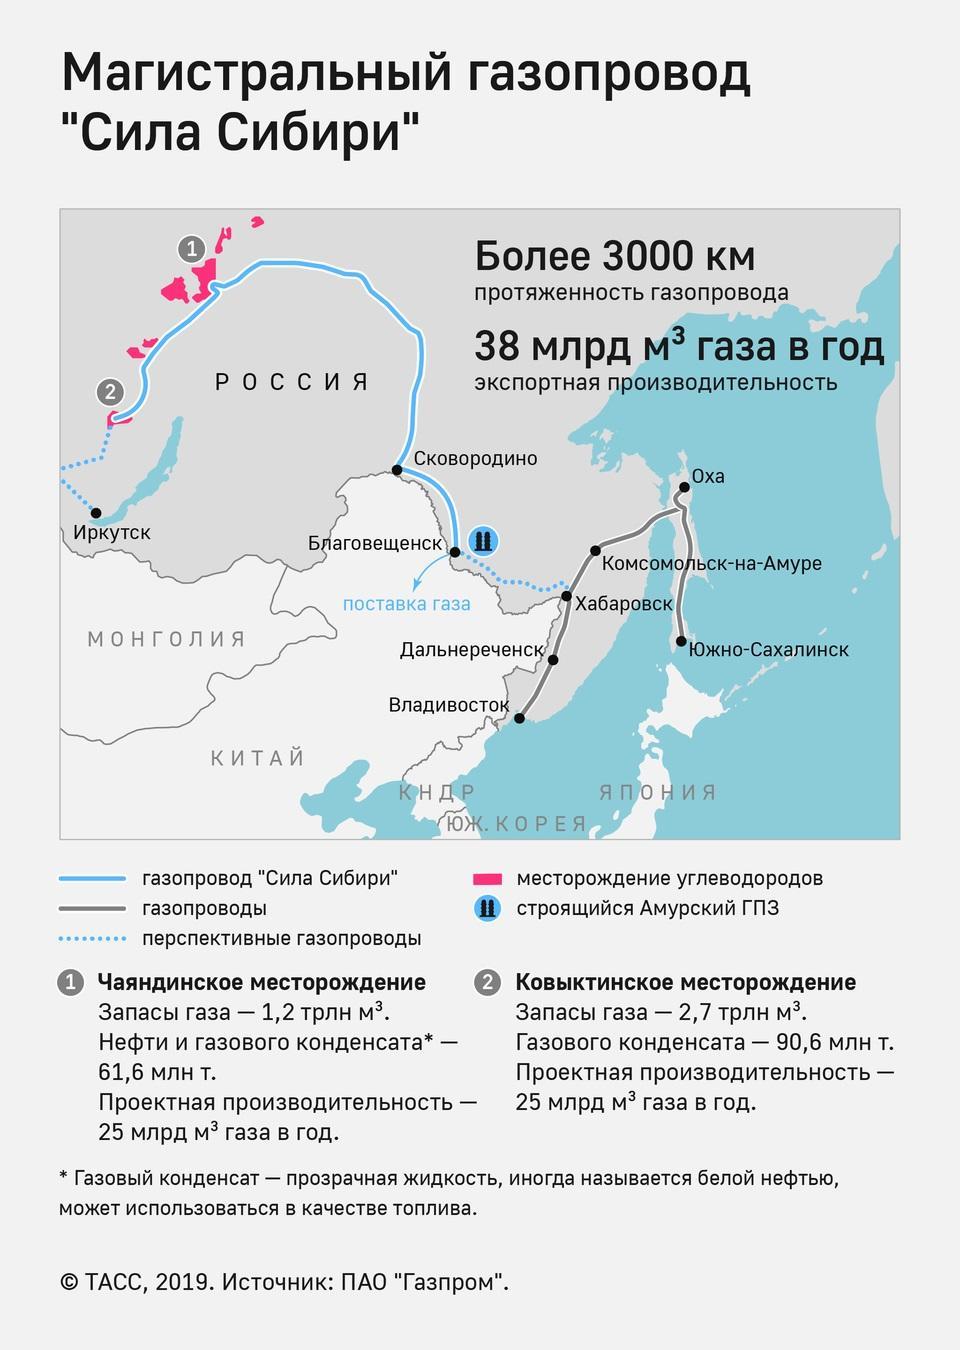 Картинки по запросу открытие  силы сибири карты схемы